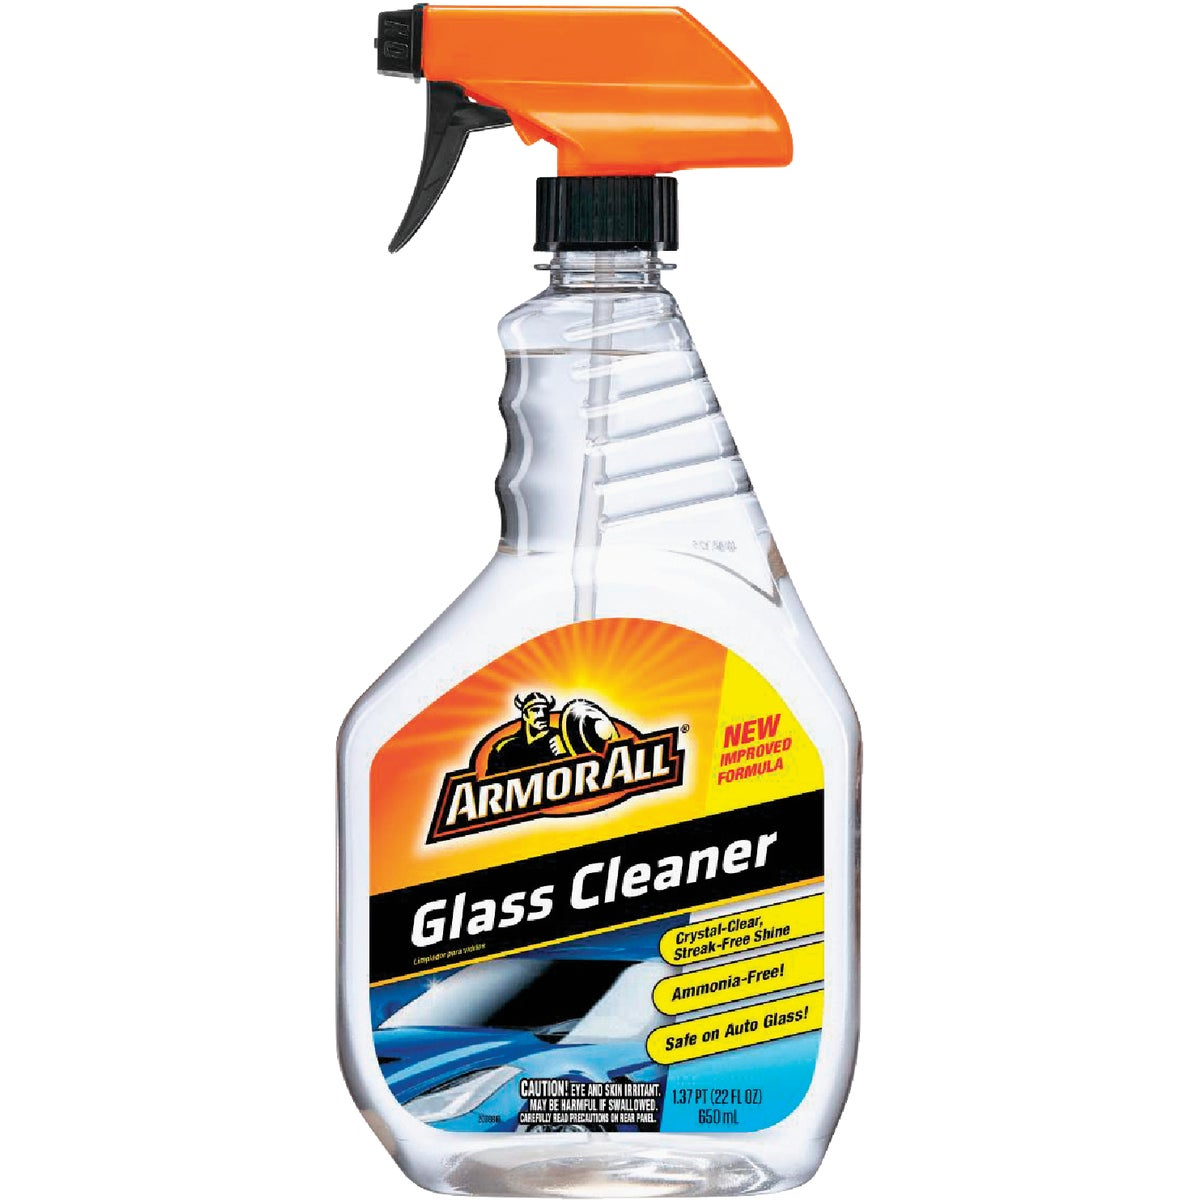 23Oz Spray Glass Cleaner